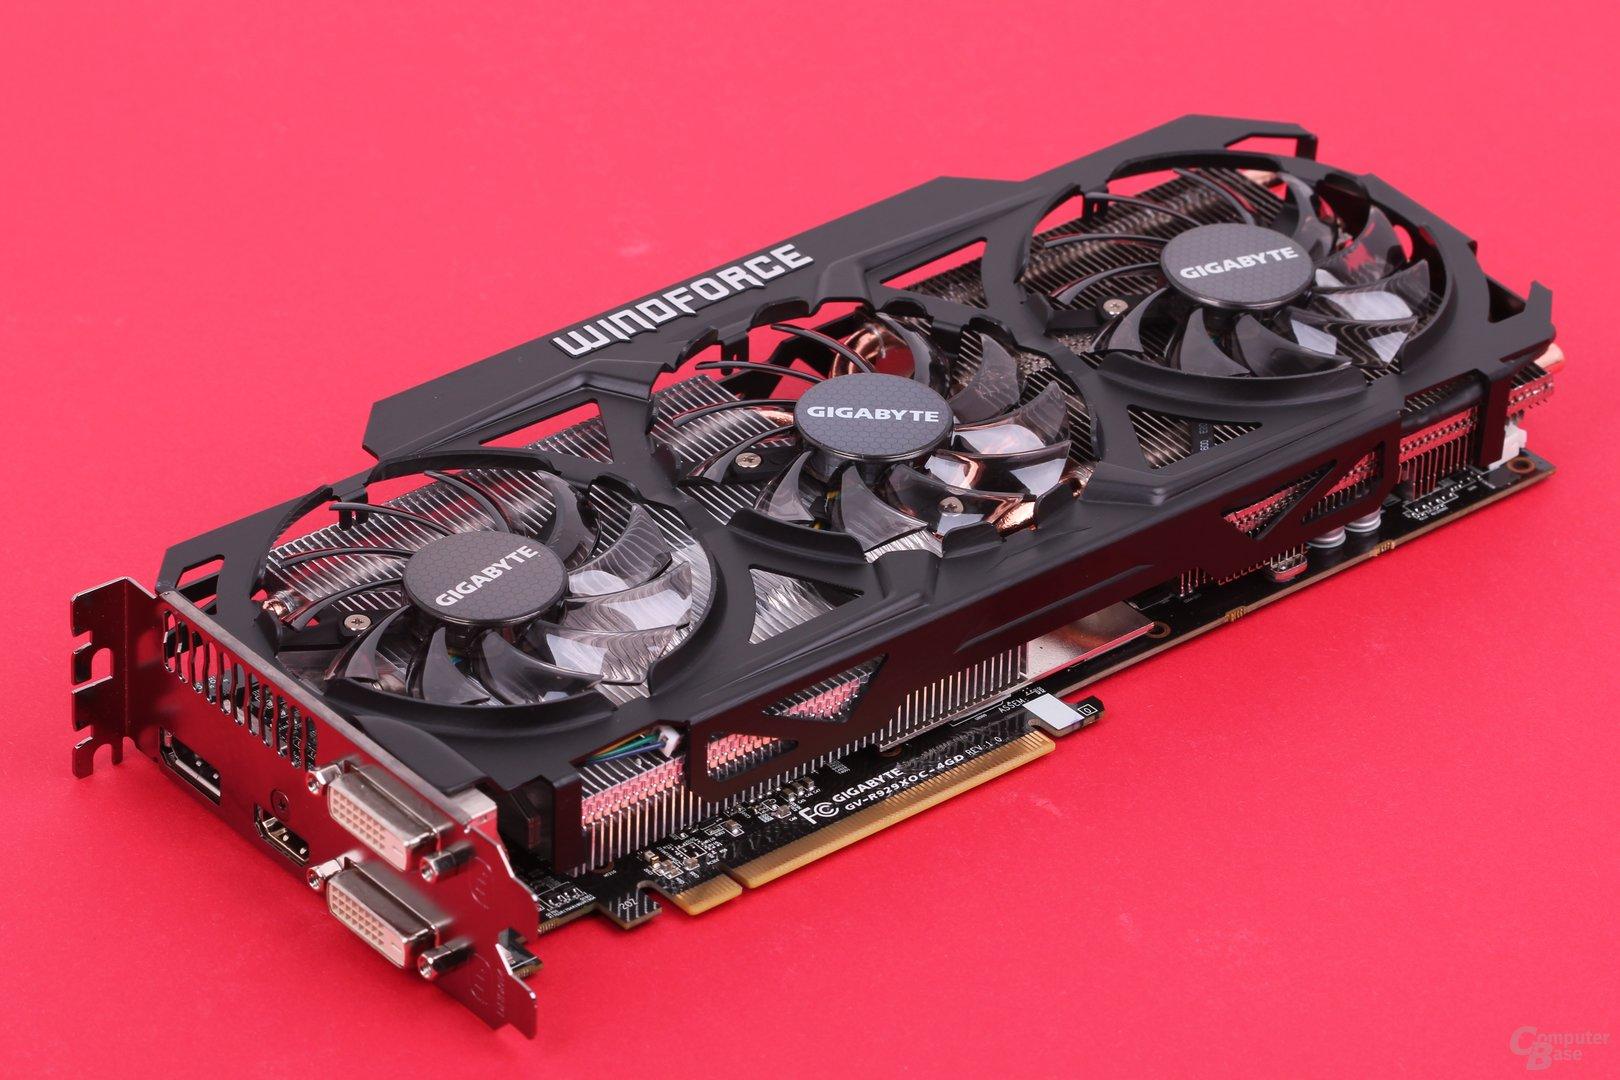 Gigabyte Radeon R9 290X WindForce - Kühlsystem